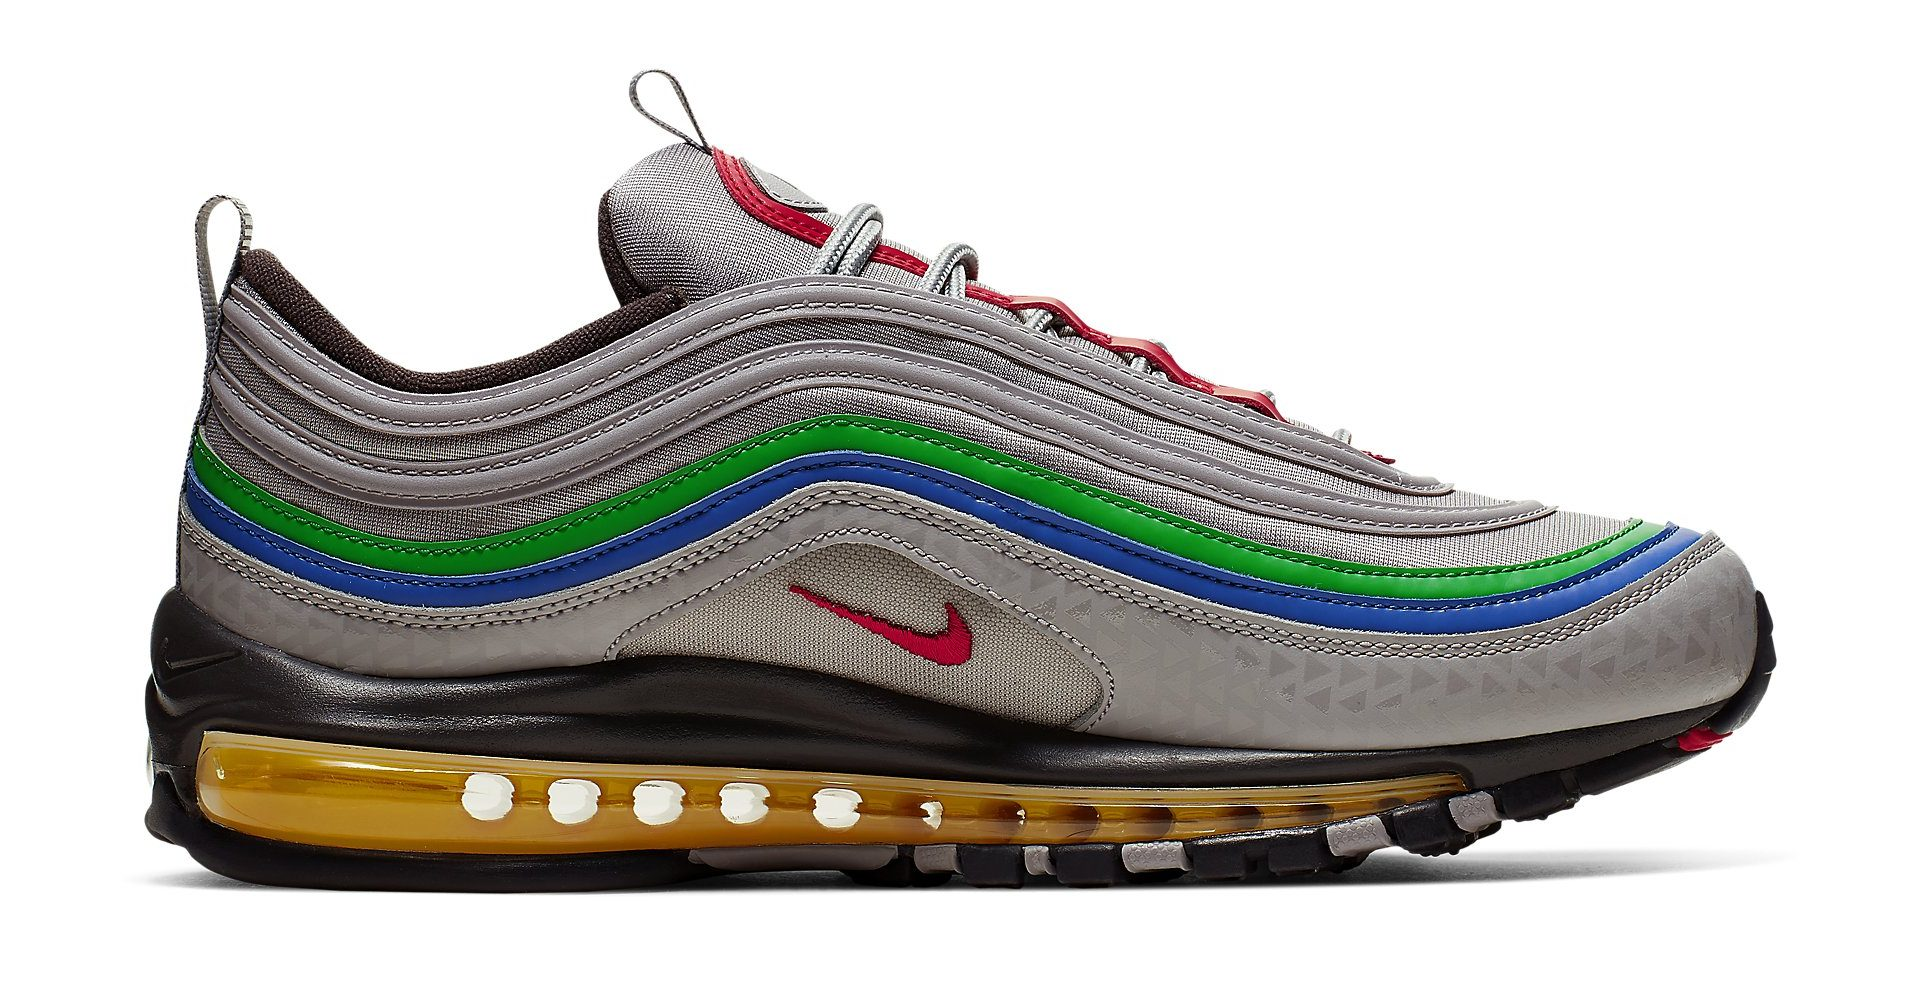 Nike Air Max 97 'Nintendo 64' Shoes